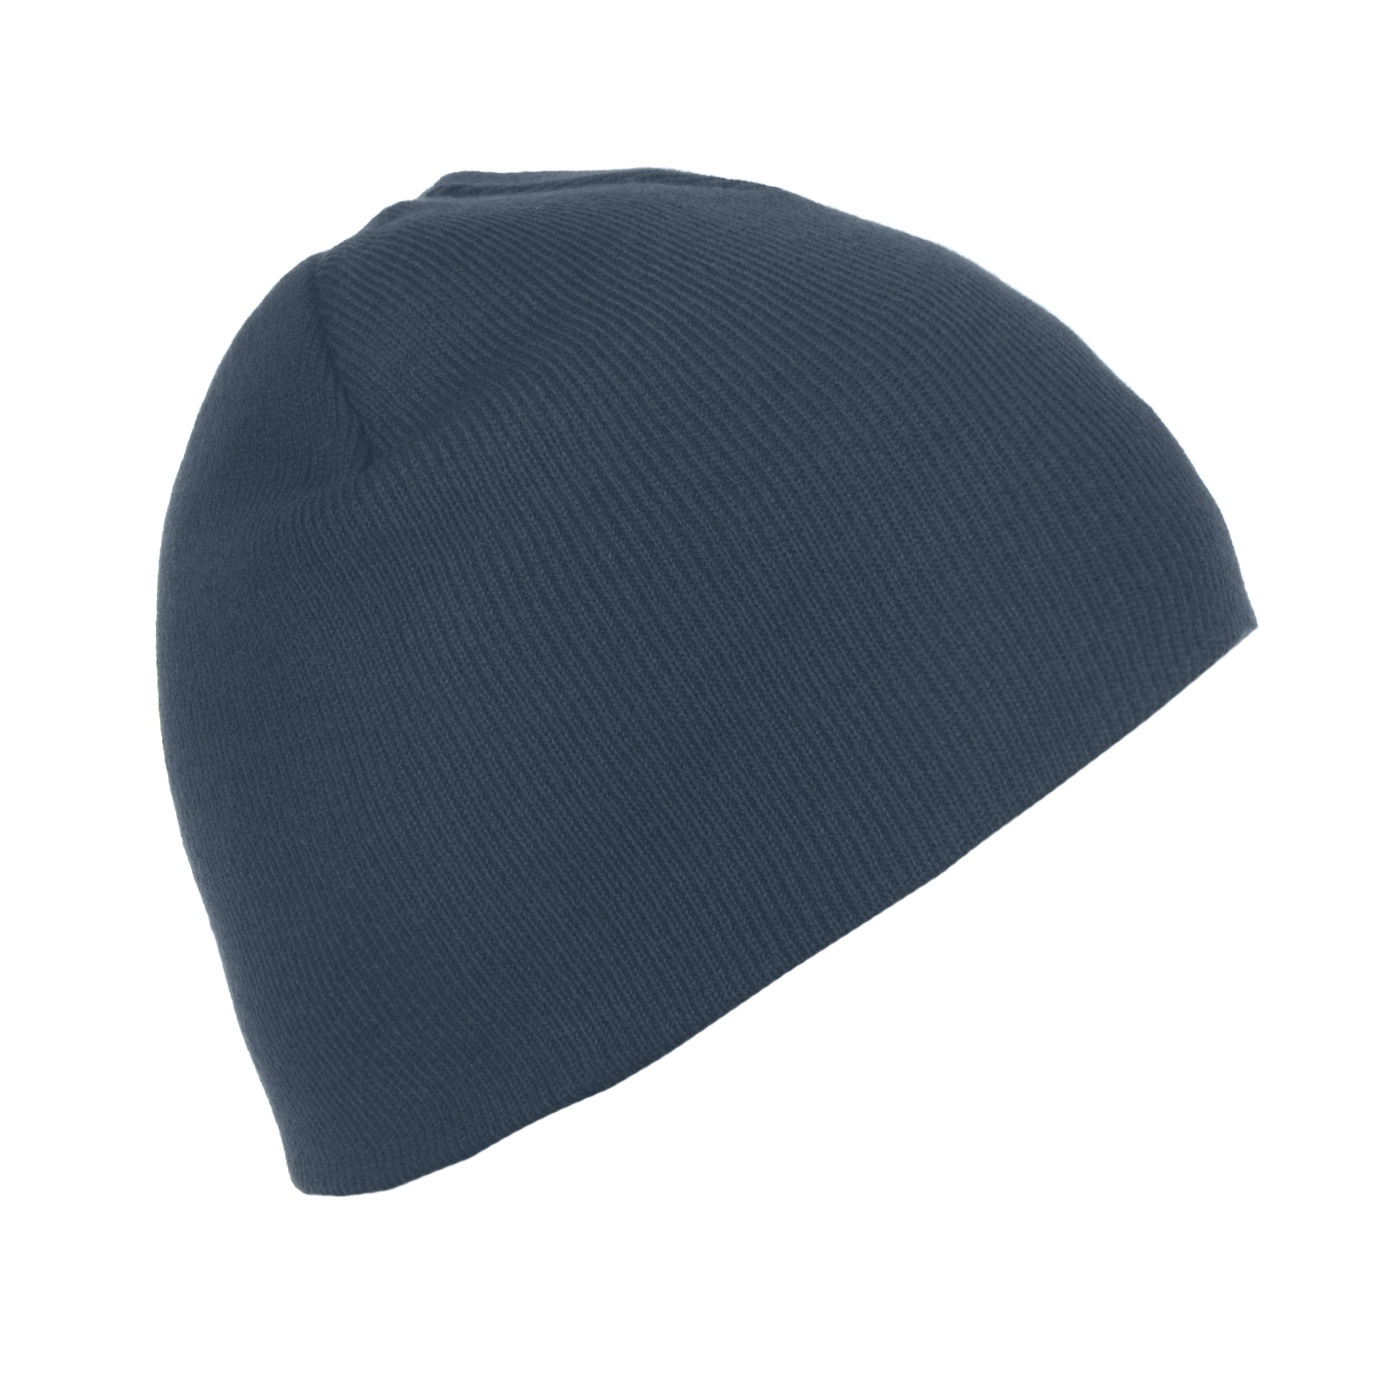 Męska czapka zimowa - granatowa